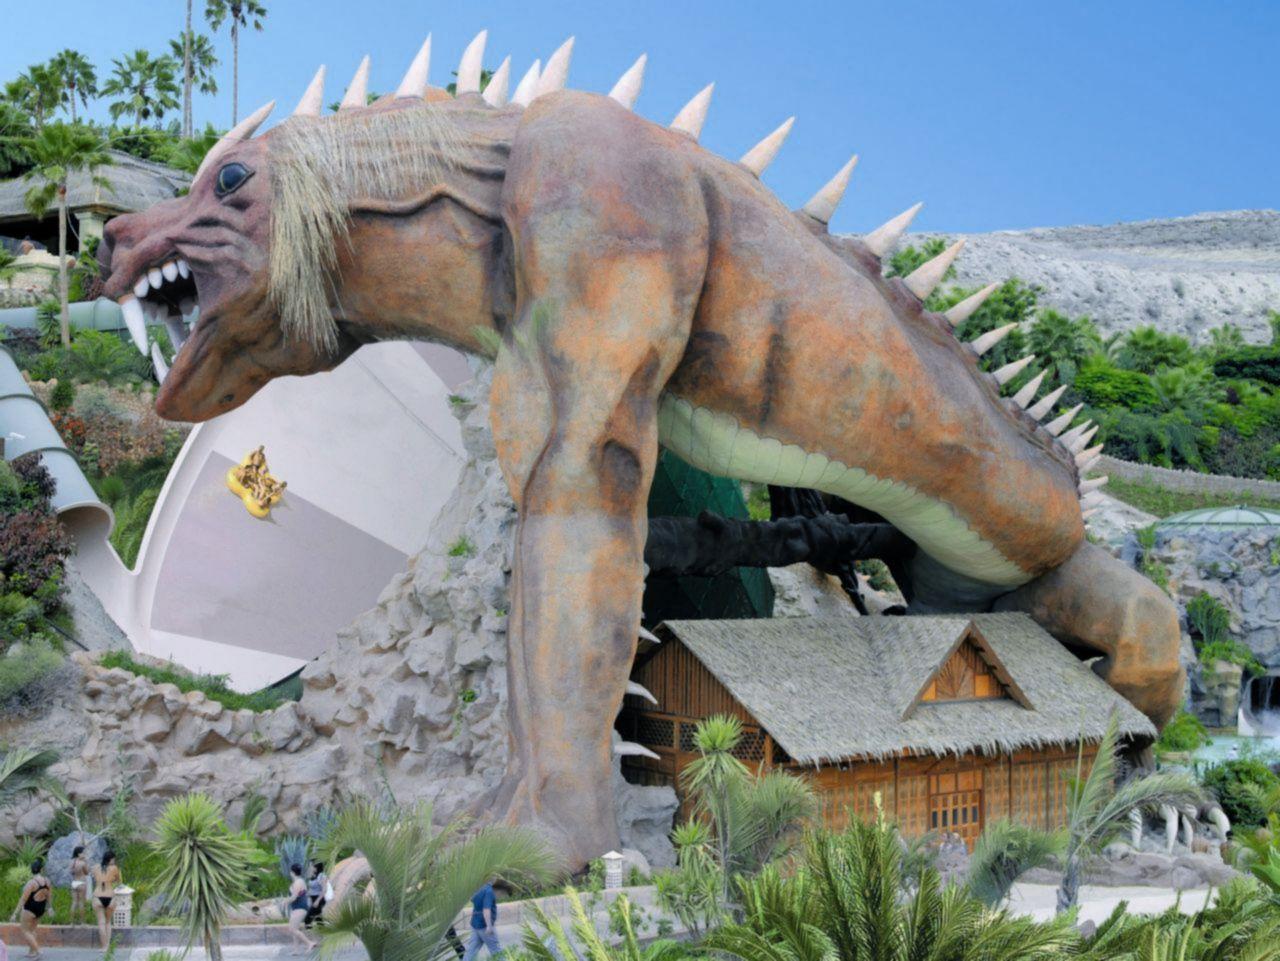 Staying In Tenerife Hotels Visit Siam Park Waterpark In Costa Adeje